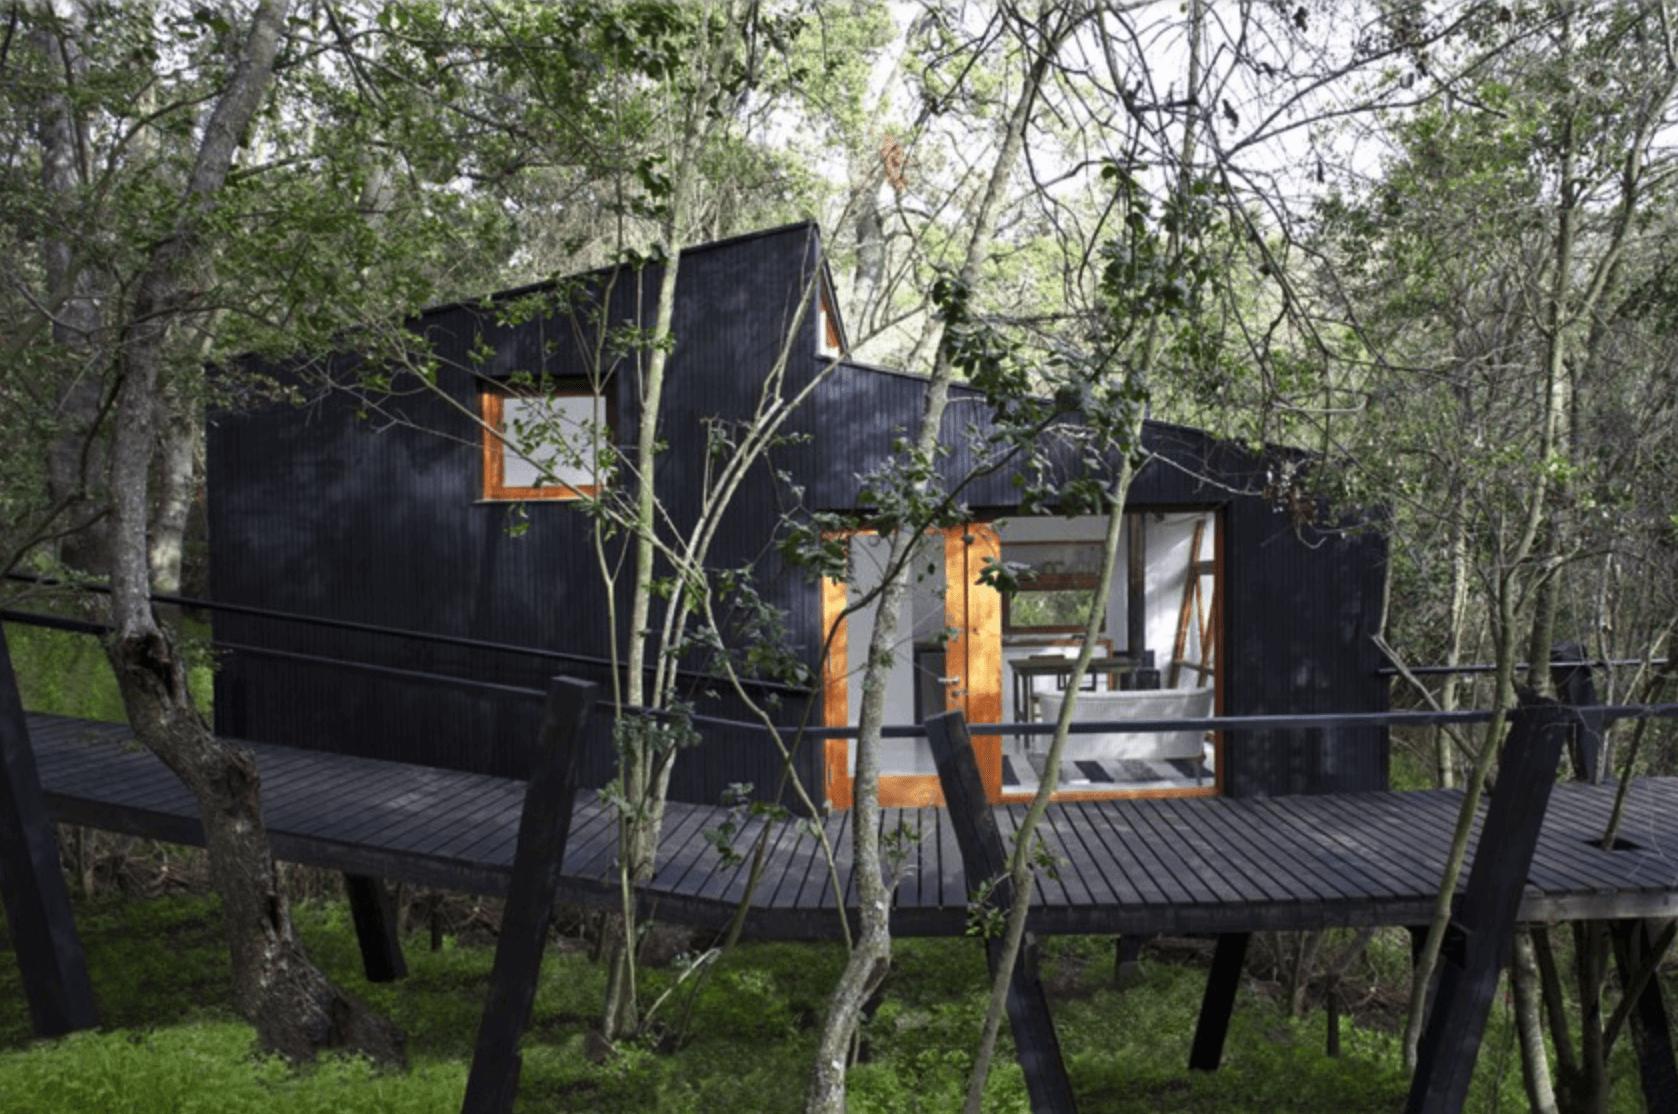 Casa de campo na floresta sobre pilotis.